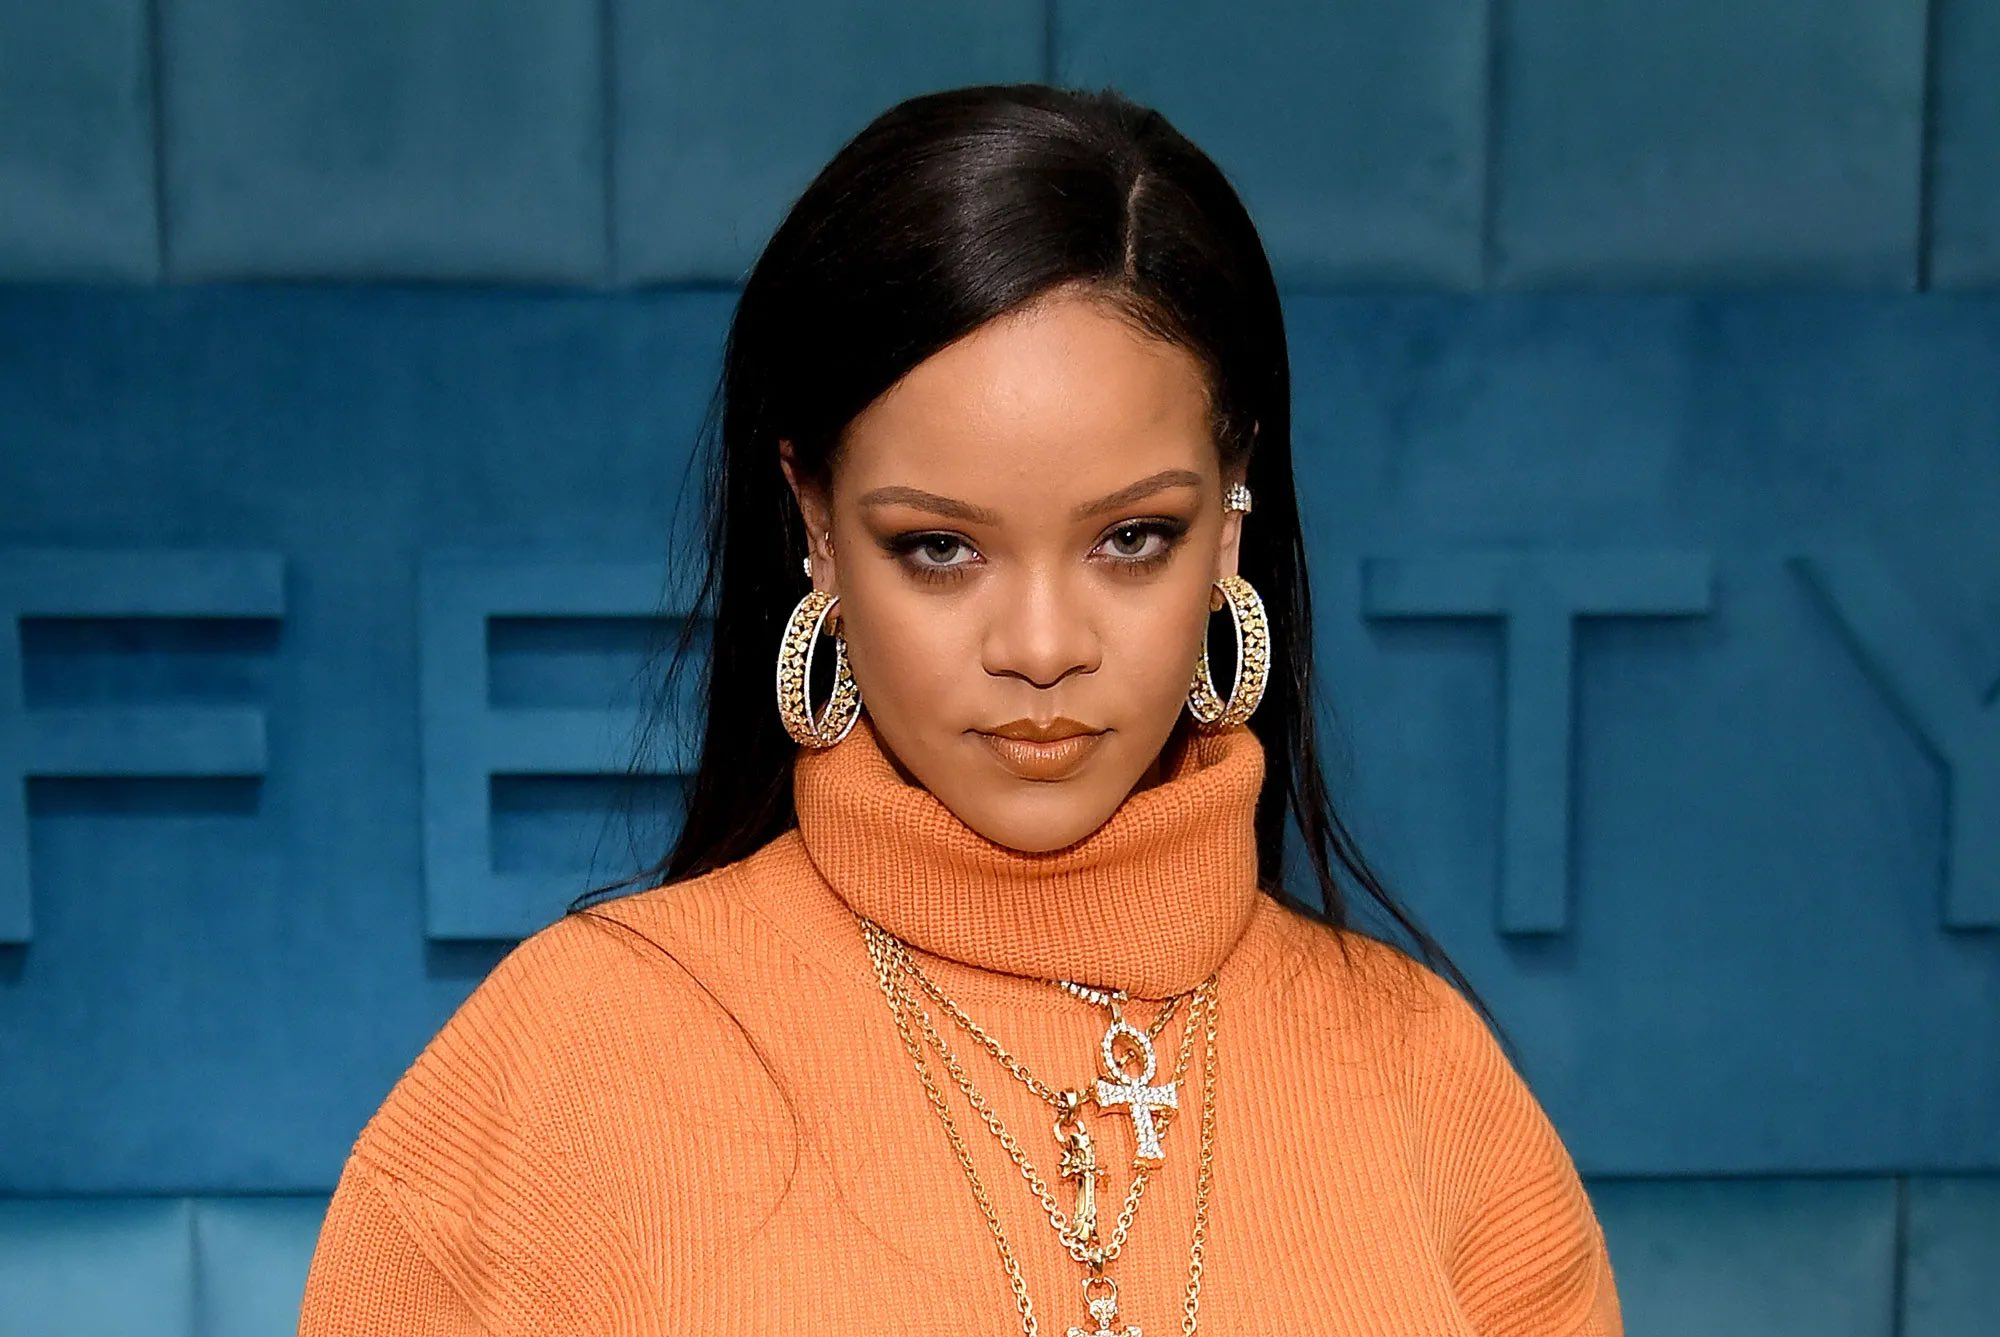 Happy Birthday to Rihanna She turns 33 years old today